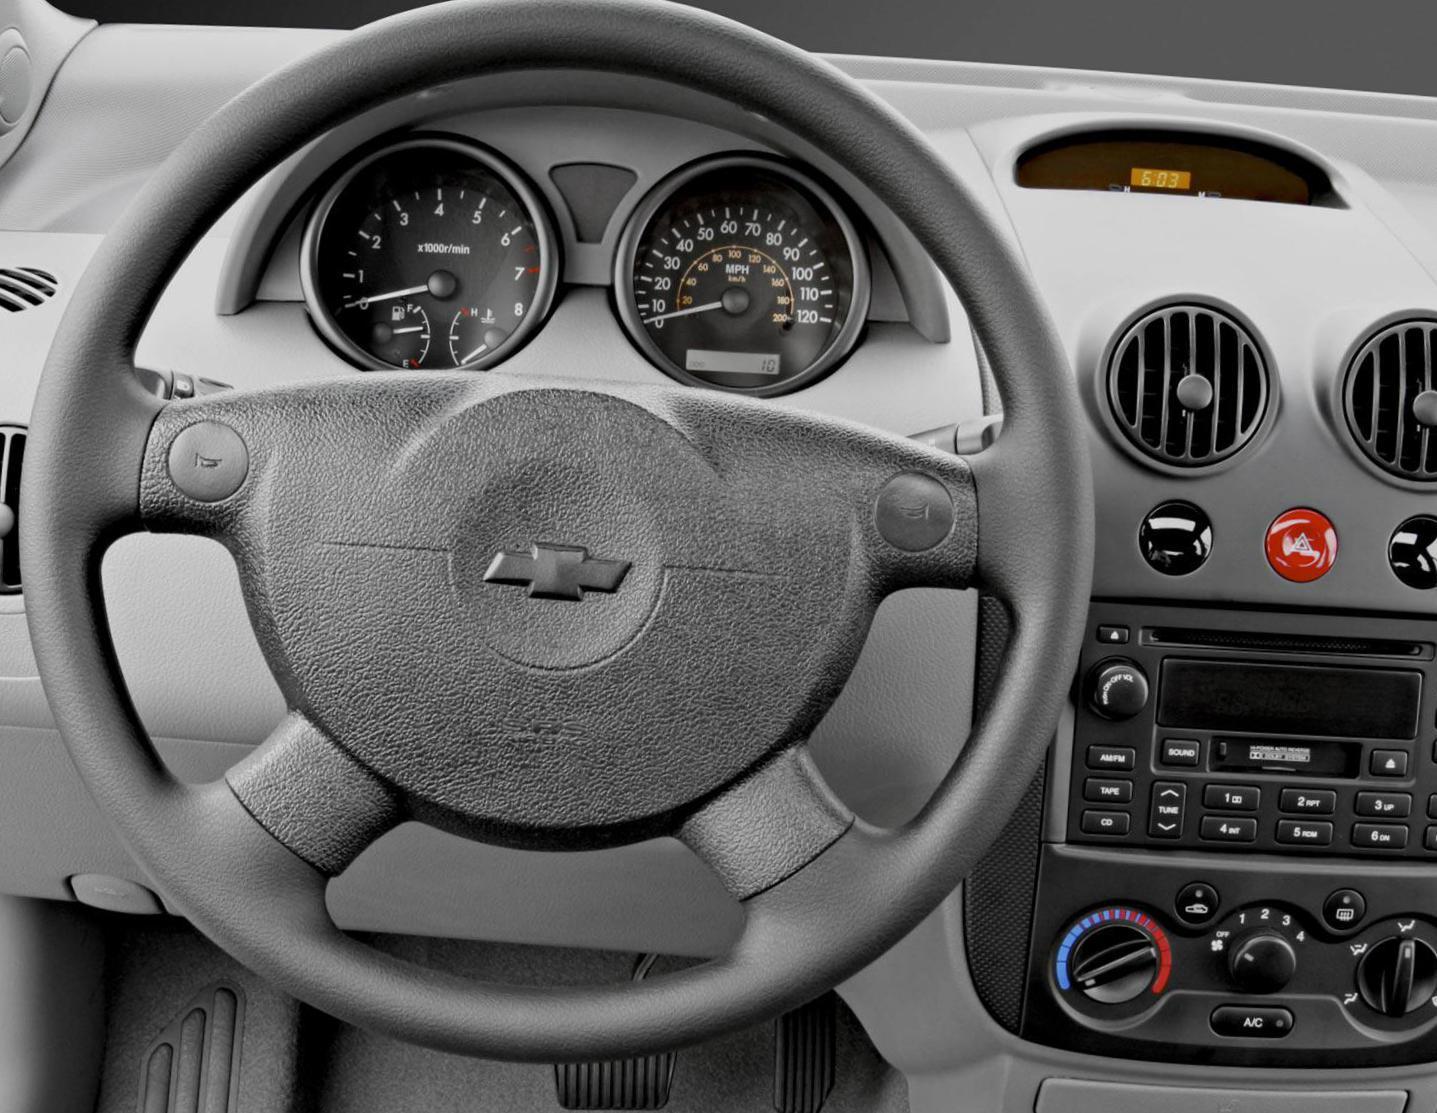 Kekurangan Chevrolet Aveo 2008 Review